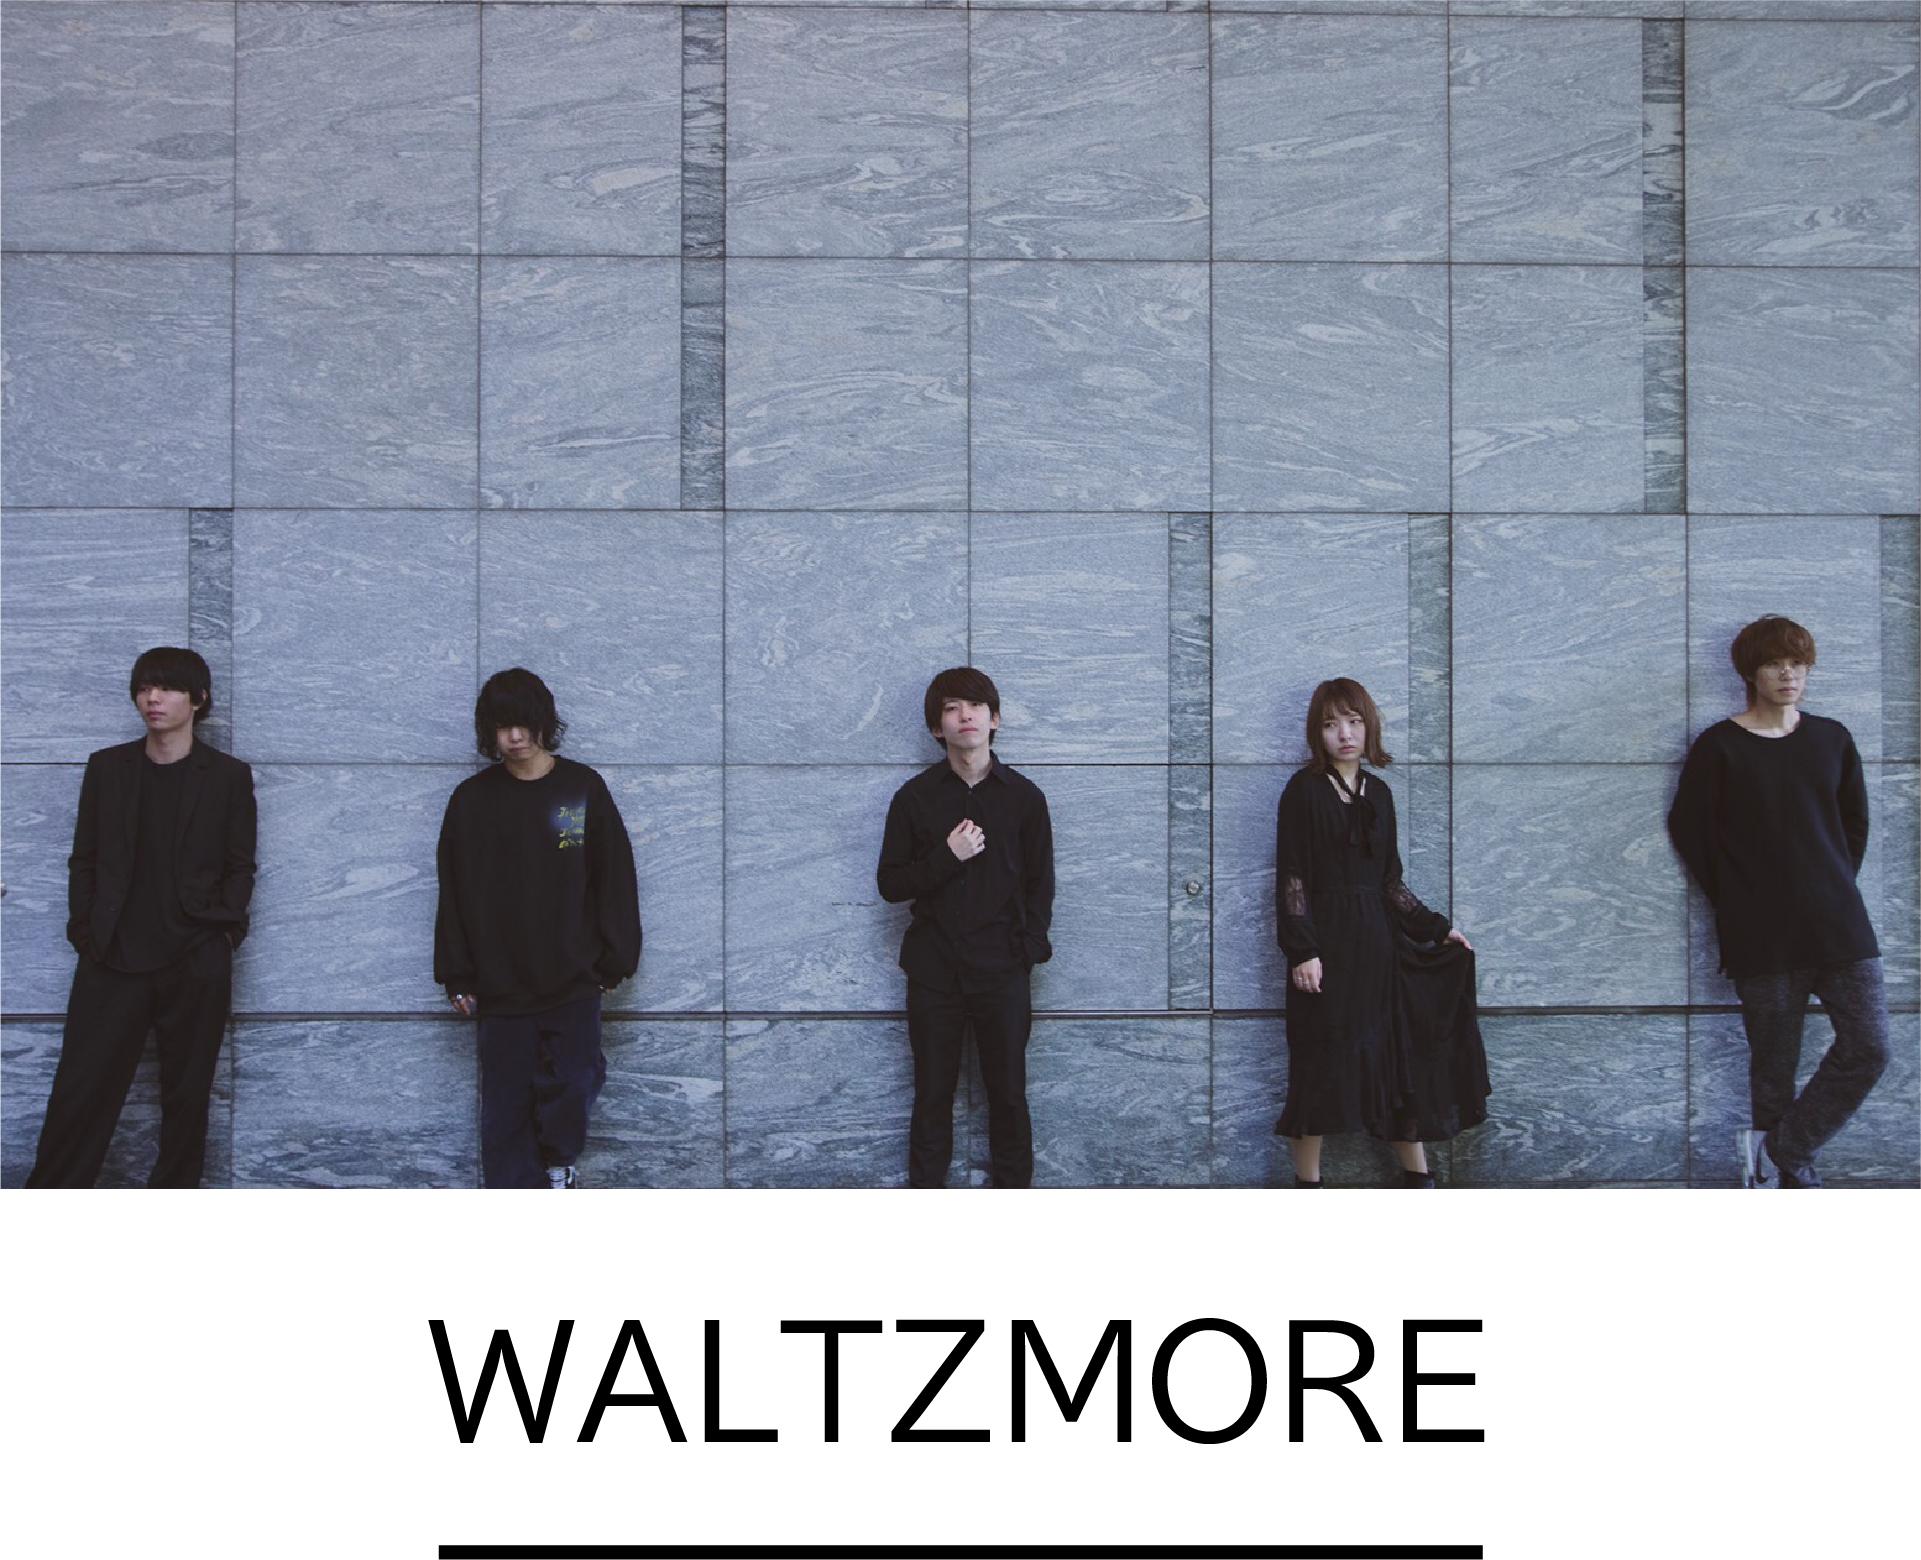 WALTZMORE